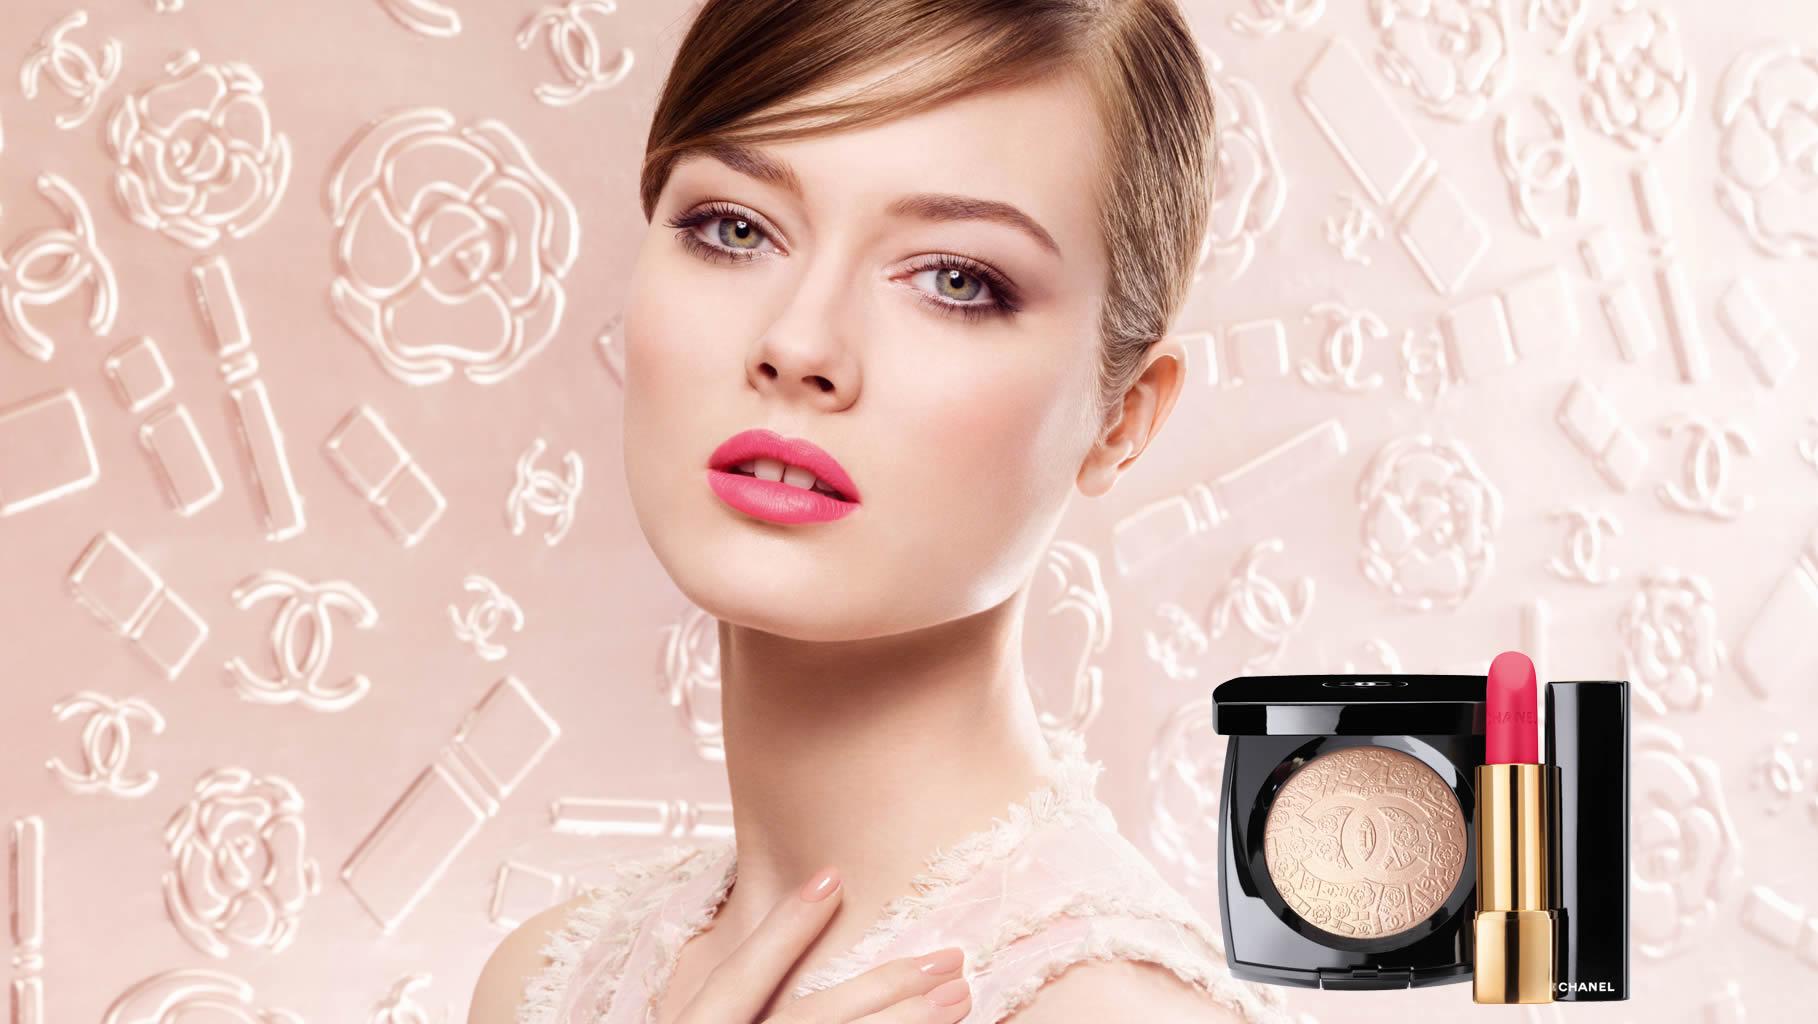 british supermodels – zarzar models – high fashion modeling agency